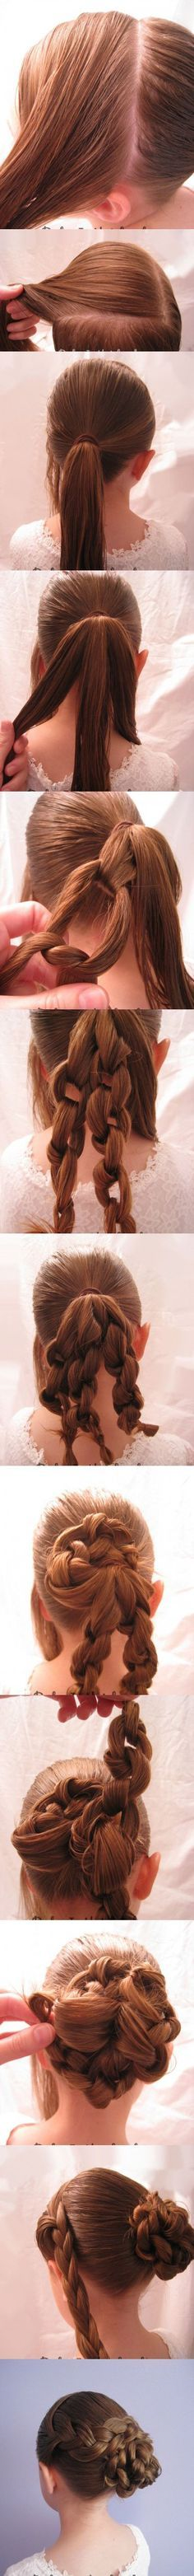 Super Effortless Knotted Bun Updo And Straightforward Bun Hairstyle Tutorials | Pinkous